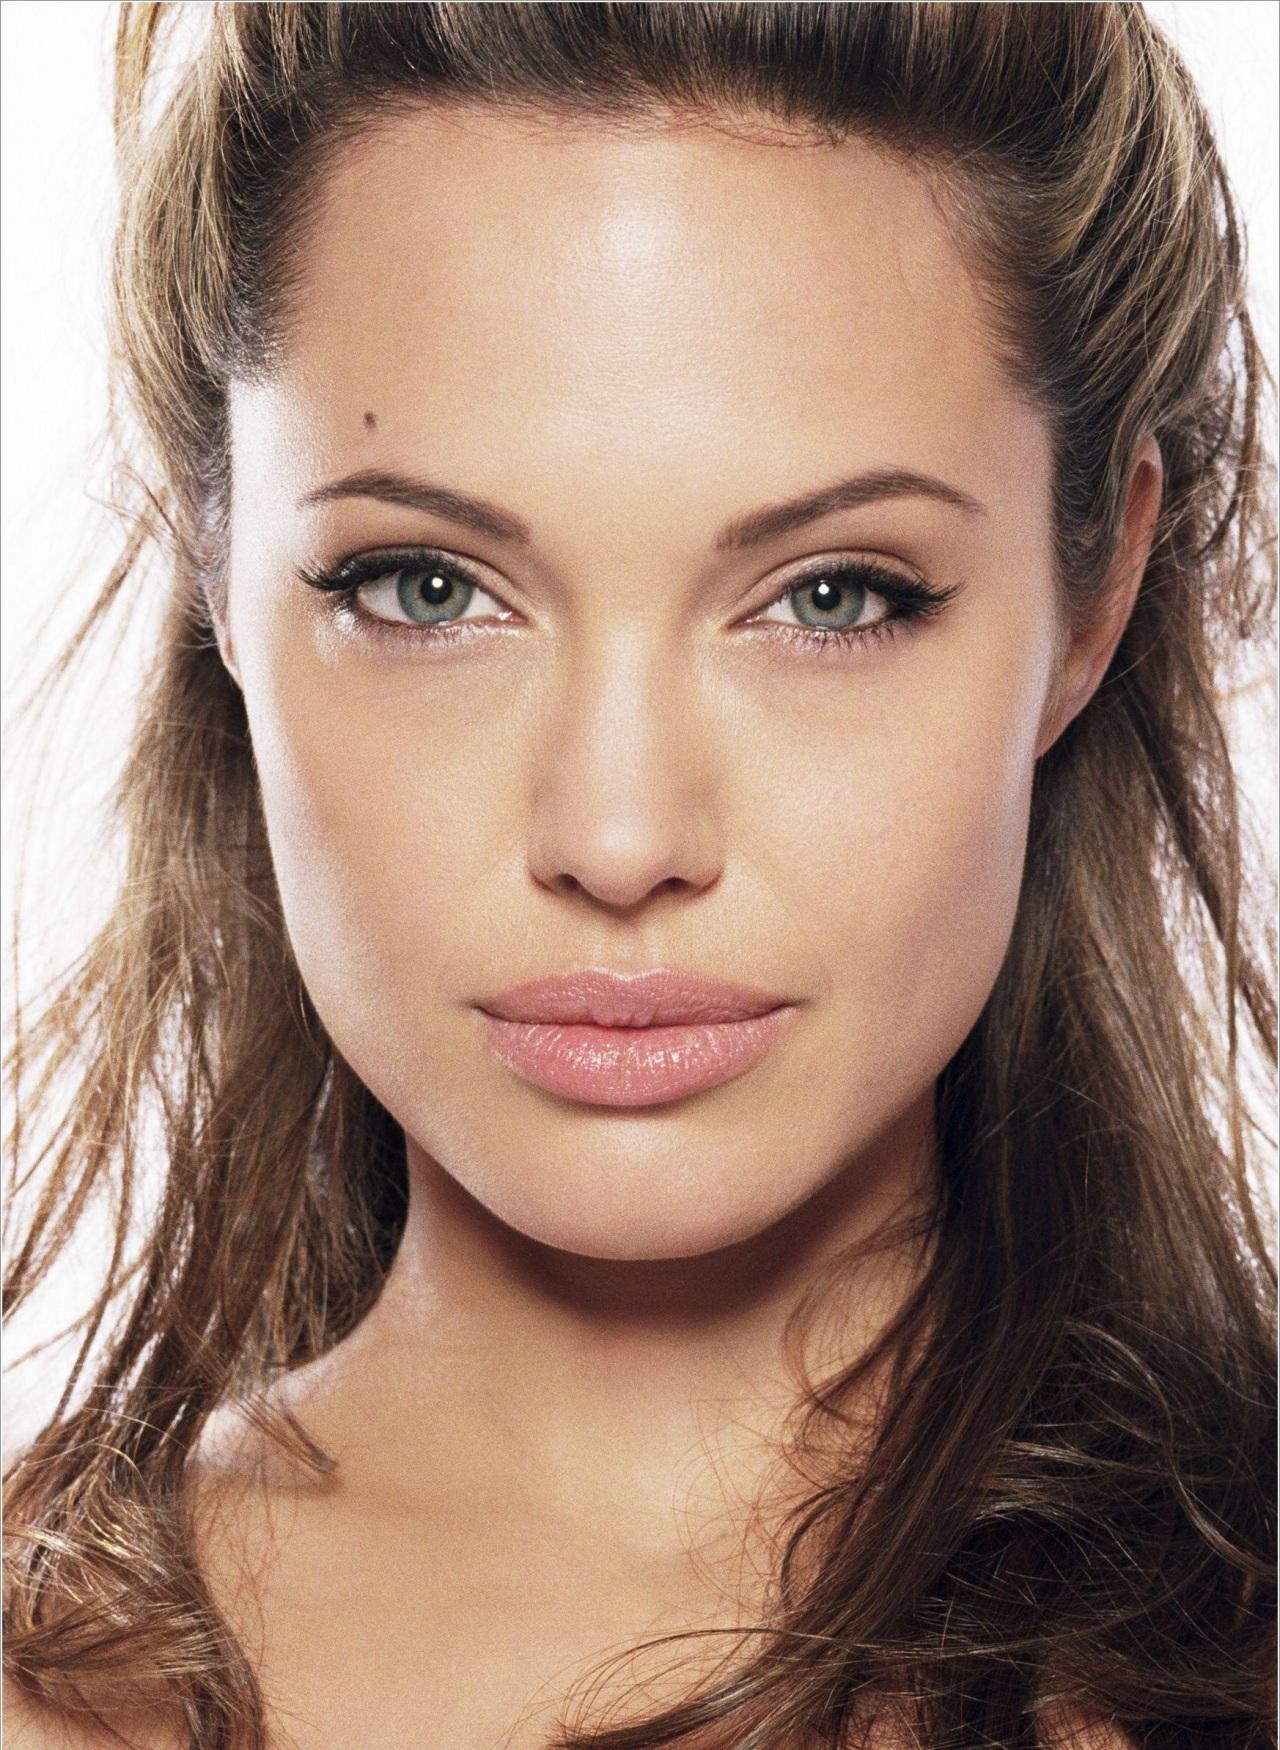 Angelina jolie lips me? remarkable